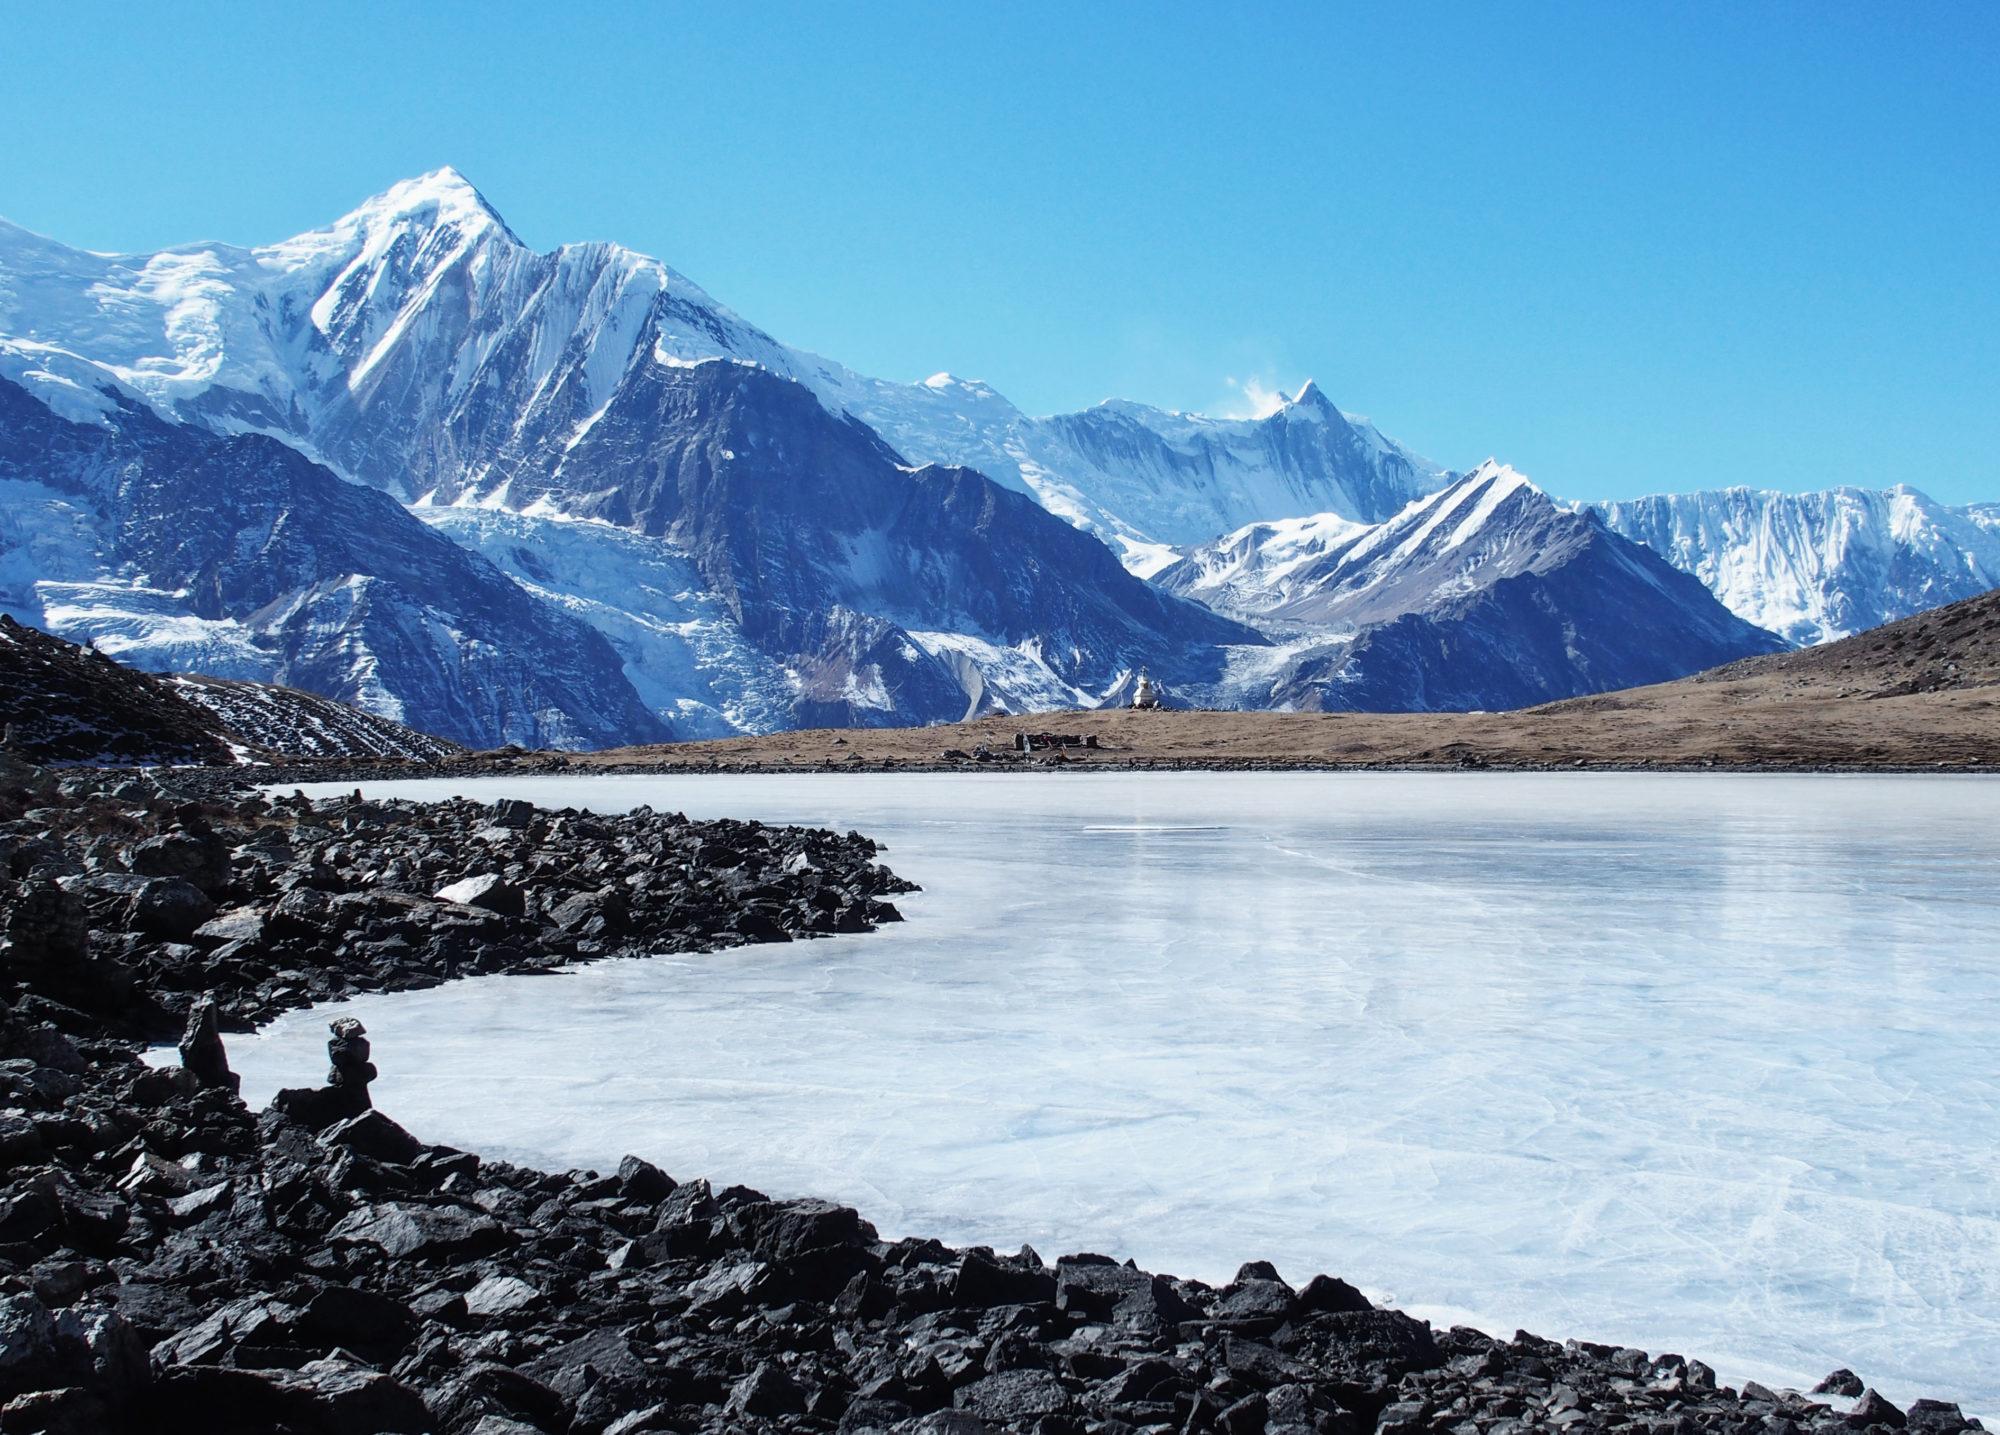 Ice Lake mit Bergpanorama - ein Traum!